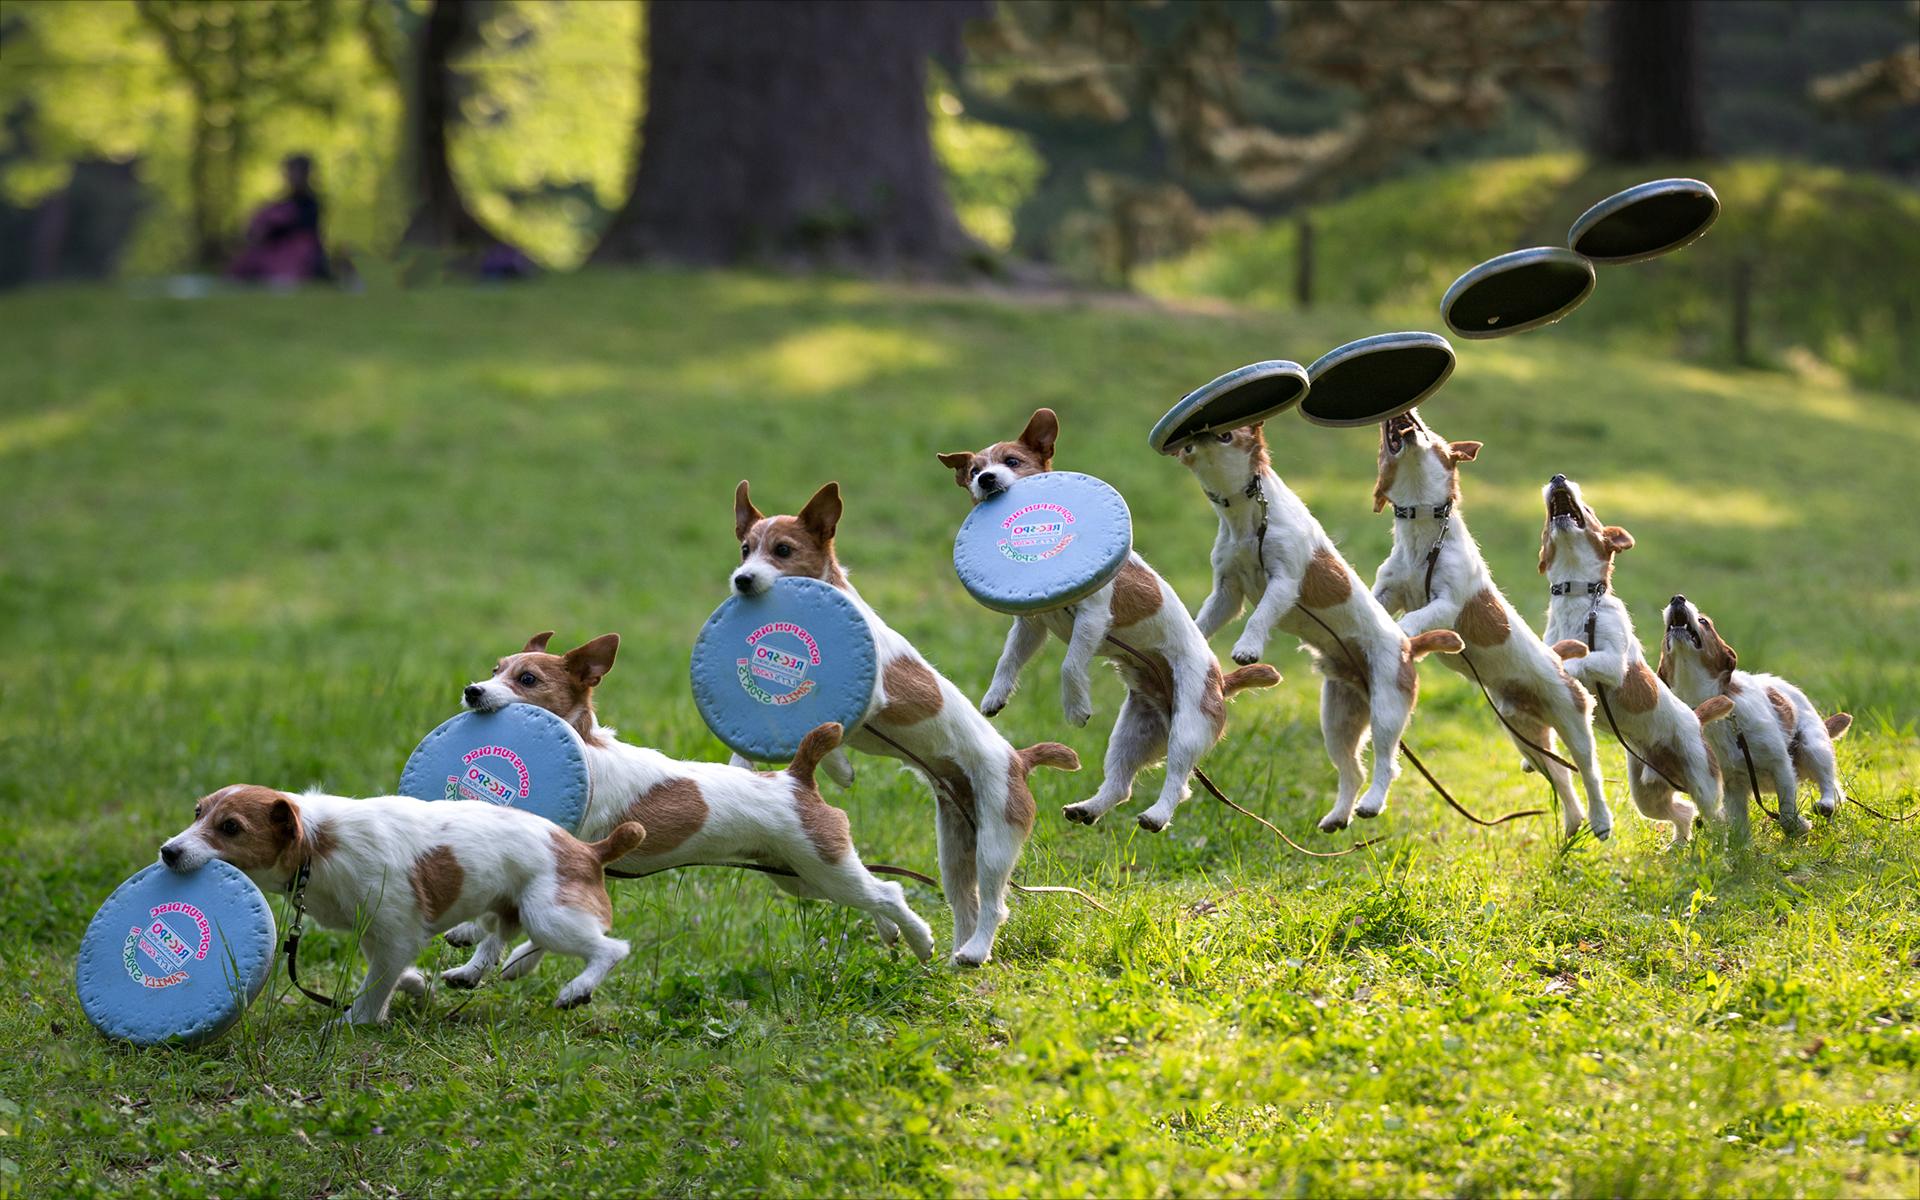 Dog frisbee catch